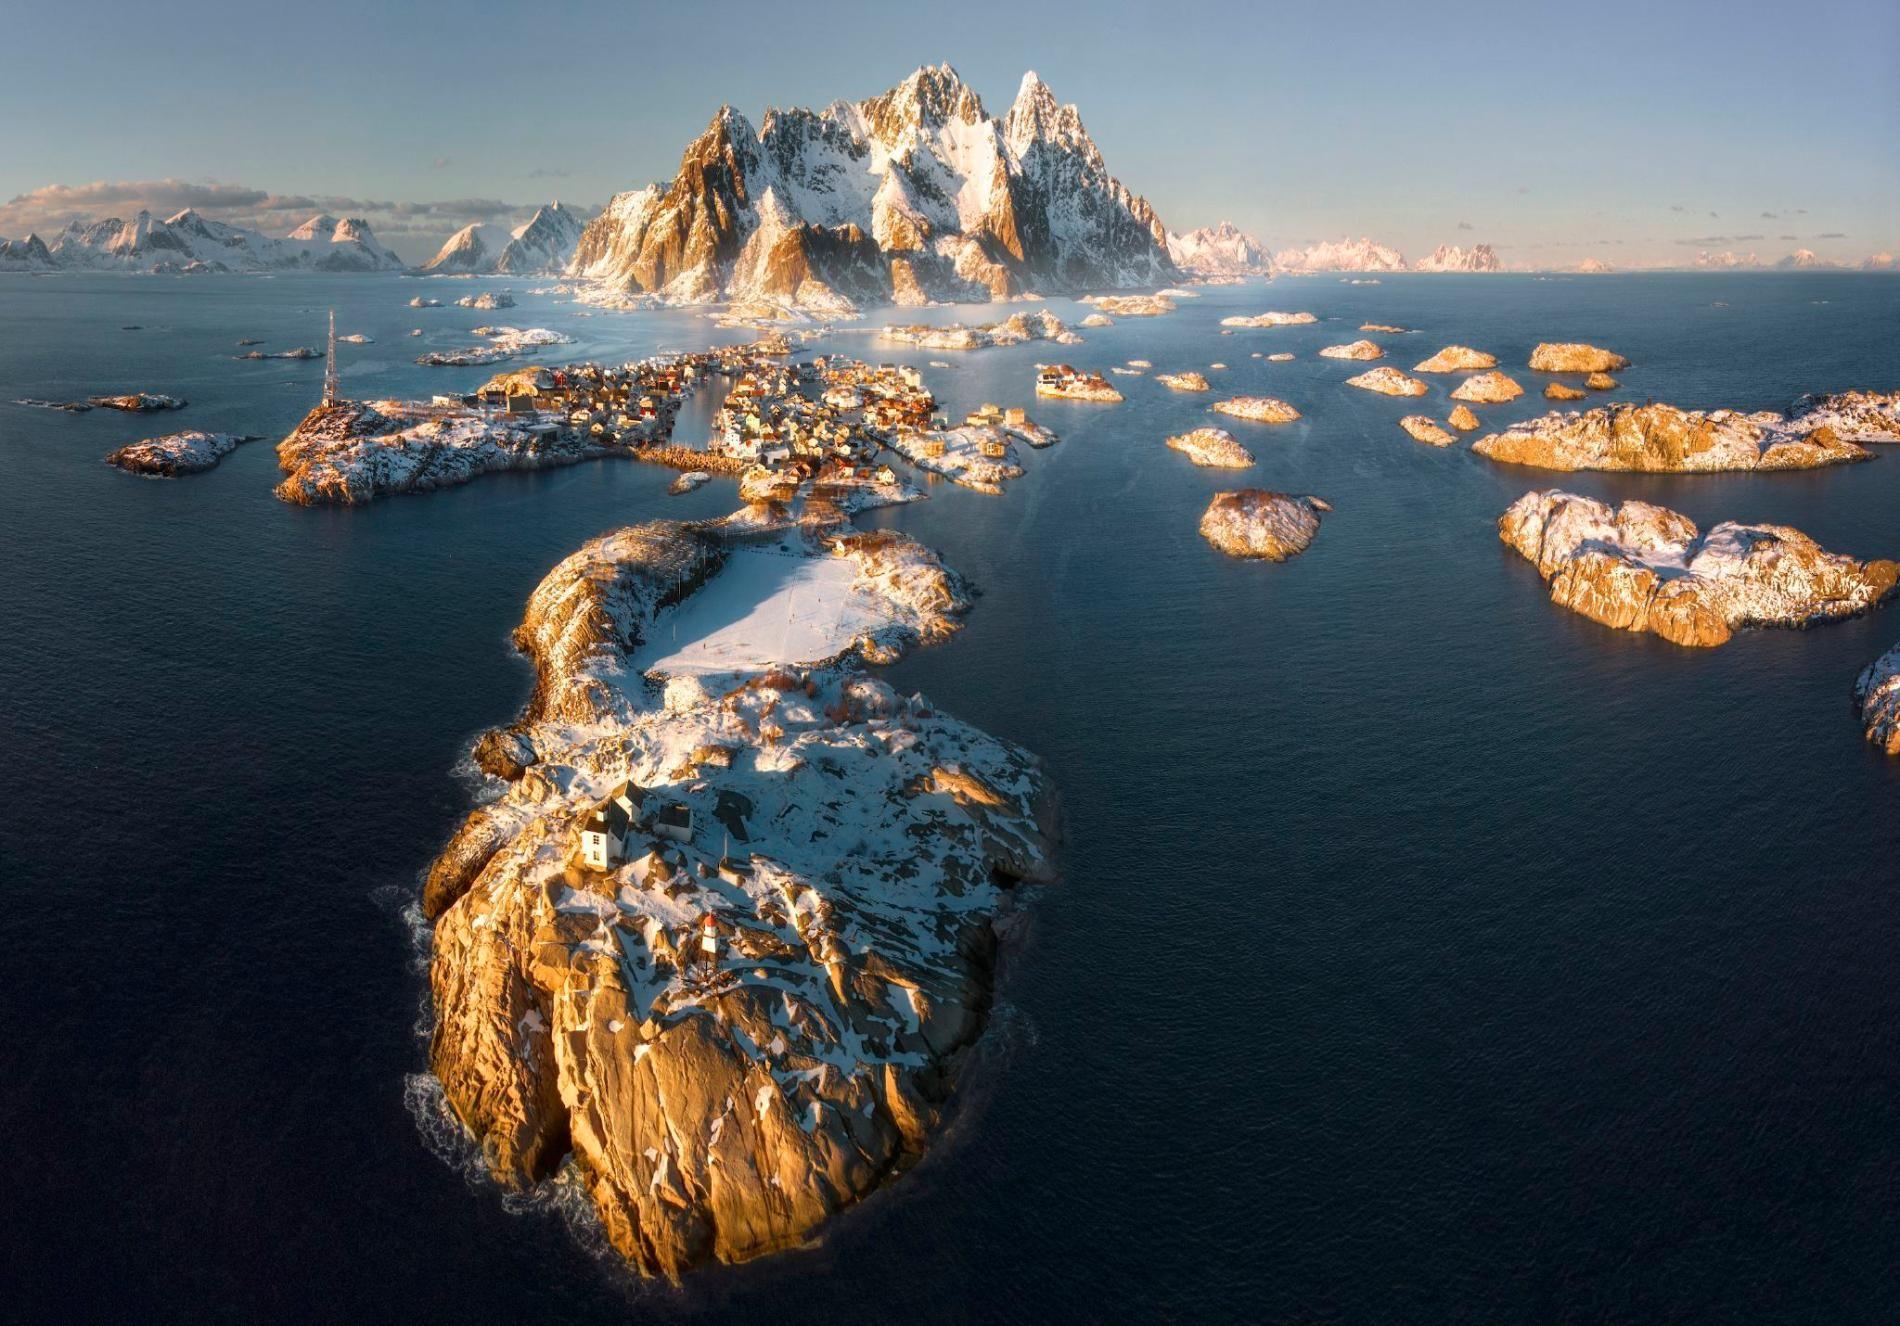 40 Epic Landscapes To Inspire Your Next Trip Landscape National Geographic Travel Iceland Landscape